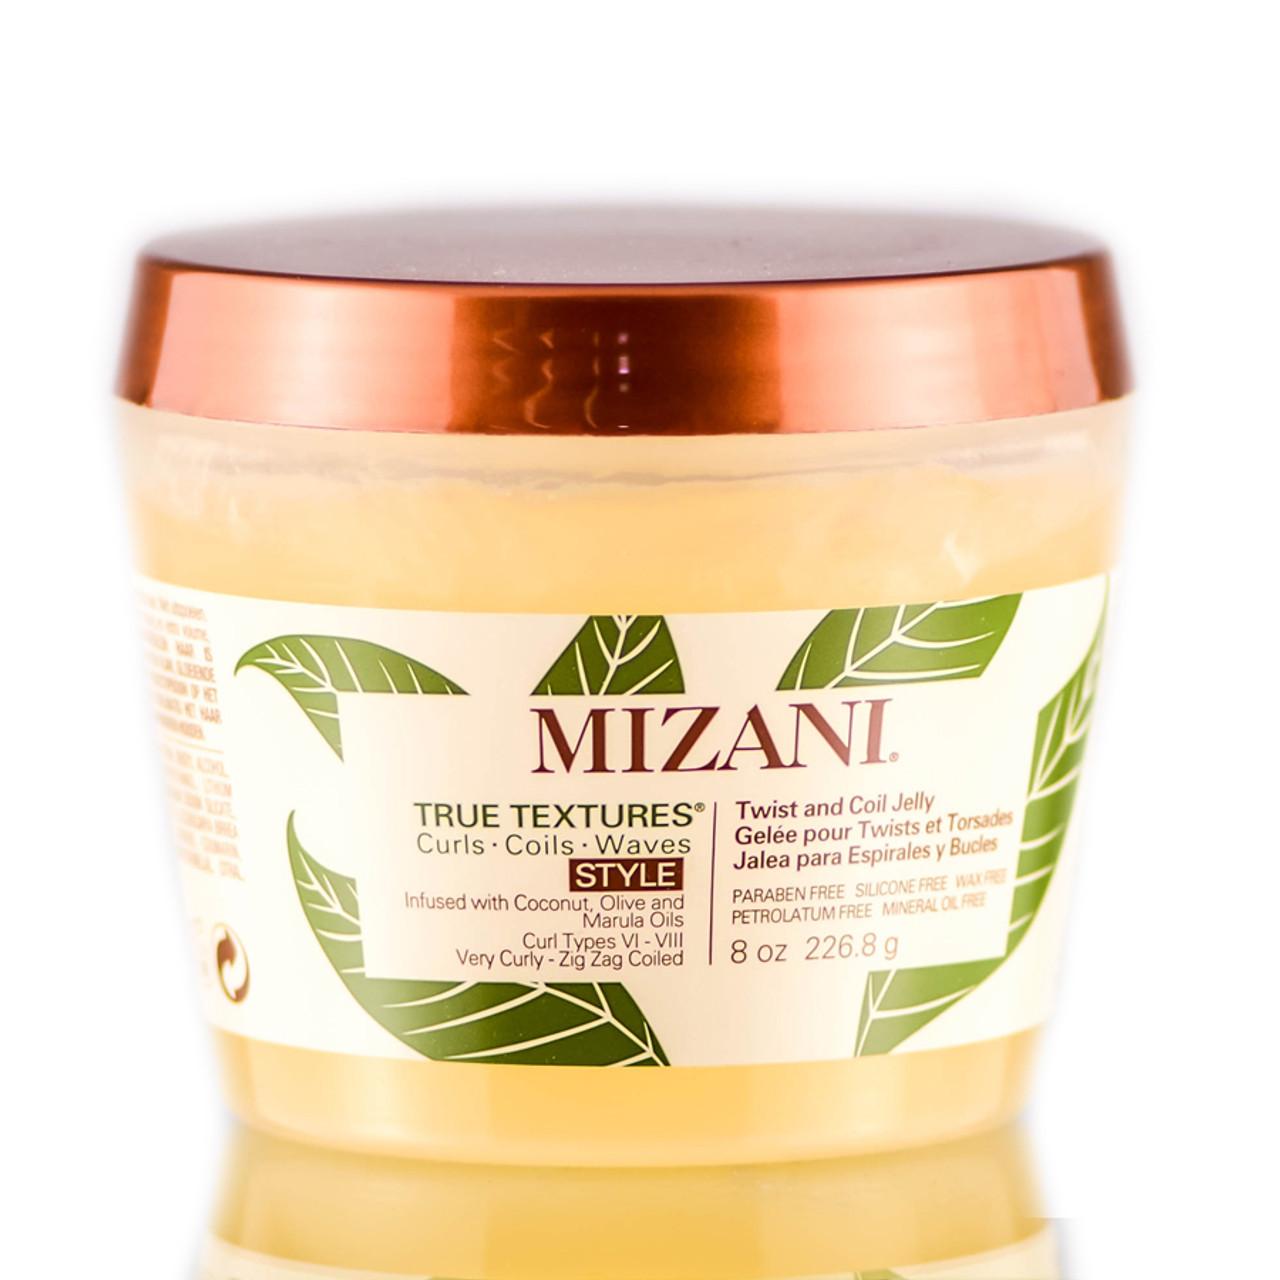 Mizani True Textures Twist and Coil Jelly - SleekShop.com (formerly Sleekhair)